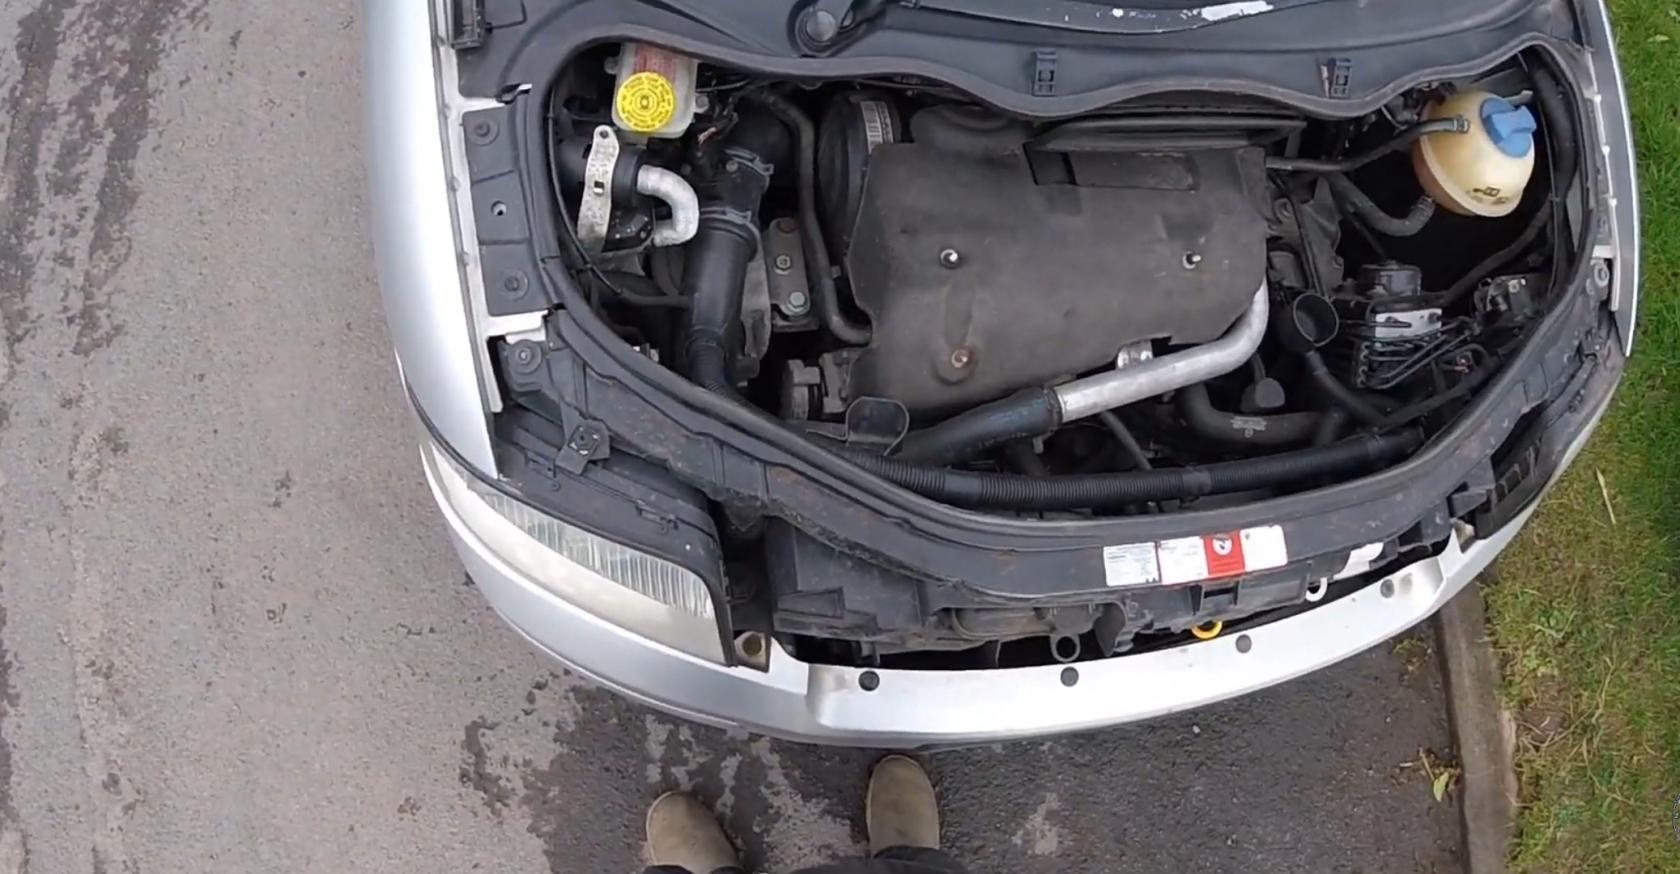 Tuto-remplacement-ampoules-AudiA2-1.jpeg